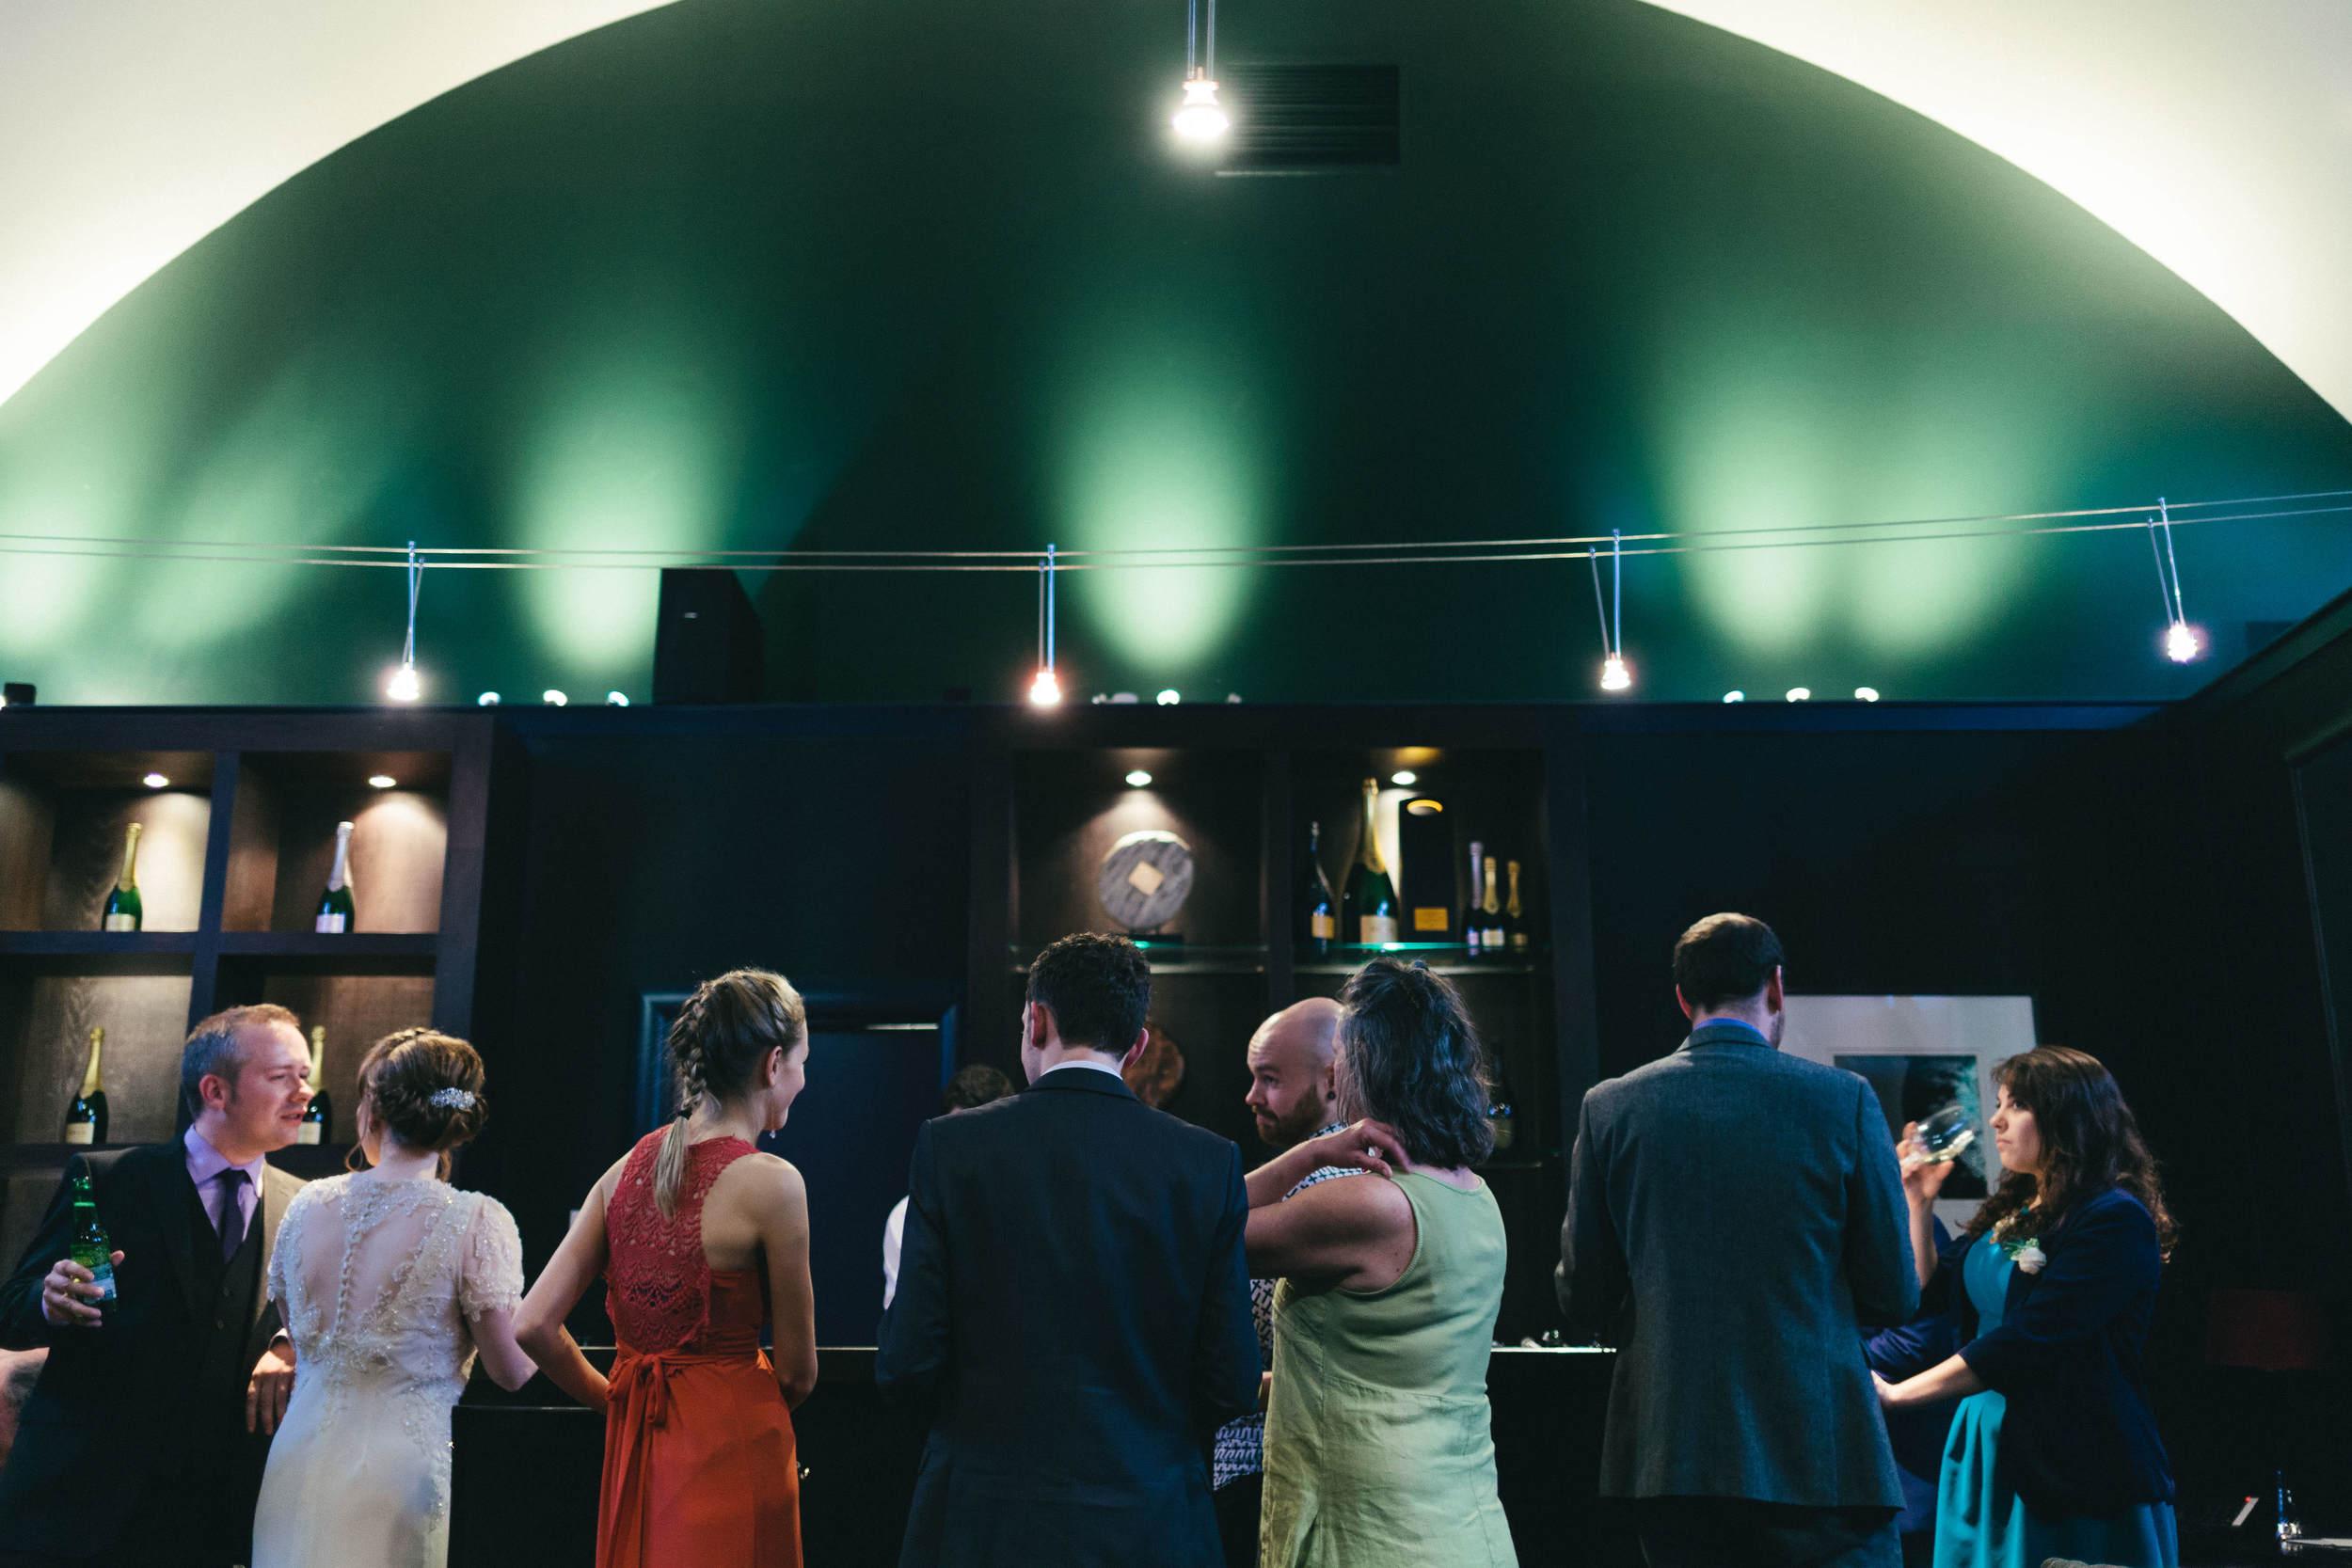 The decor of Malmaison oozes class since its latest refurbishment